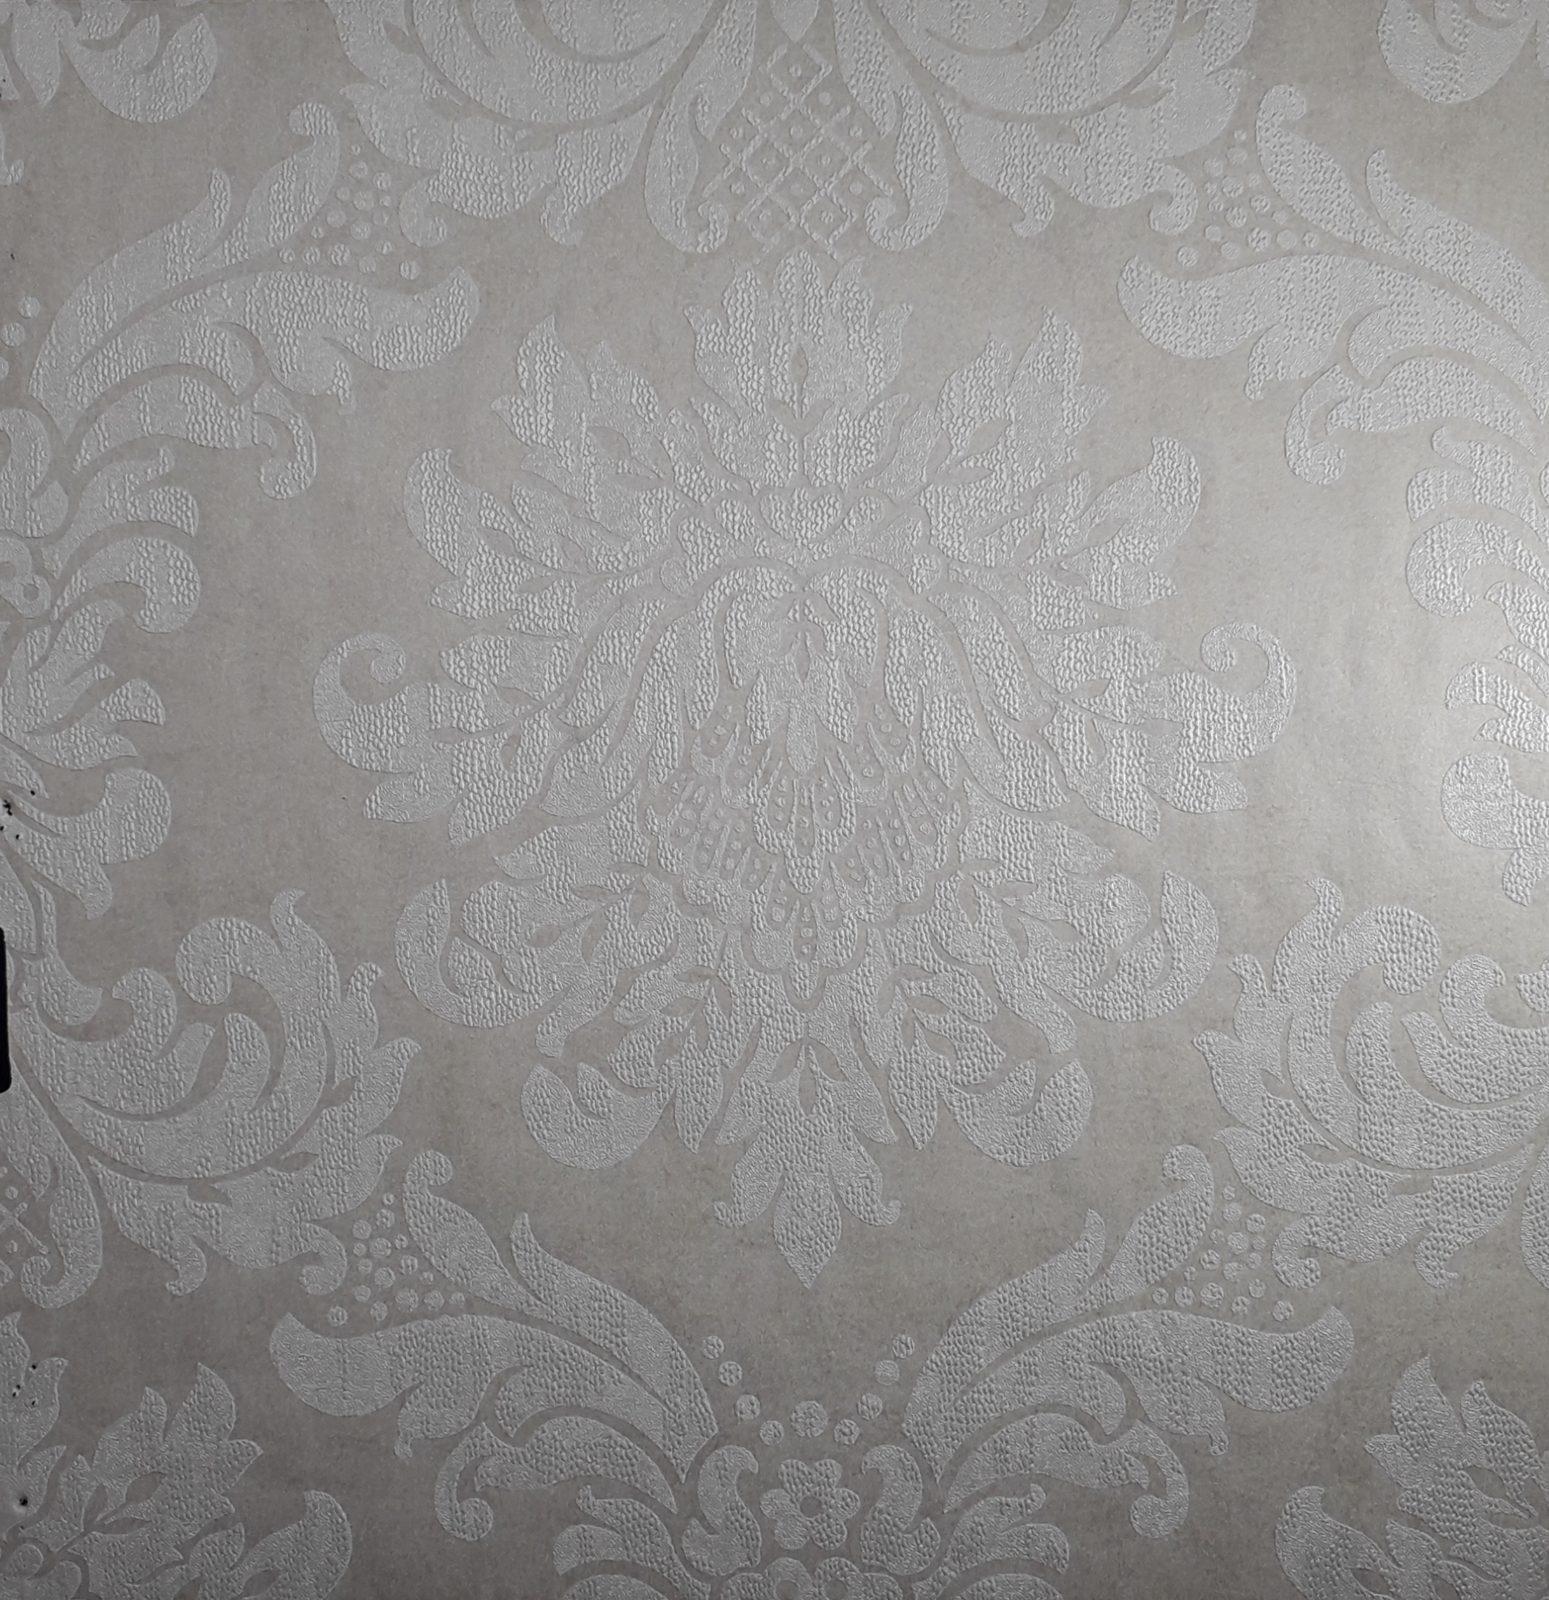 Uniwal Cream And Gold Damask Wallpaper Cat24471 Wallpaper World